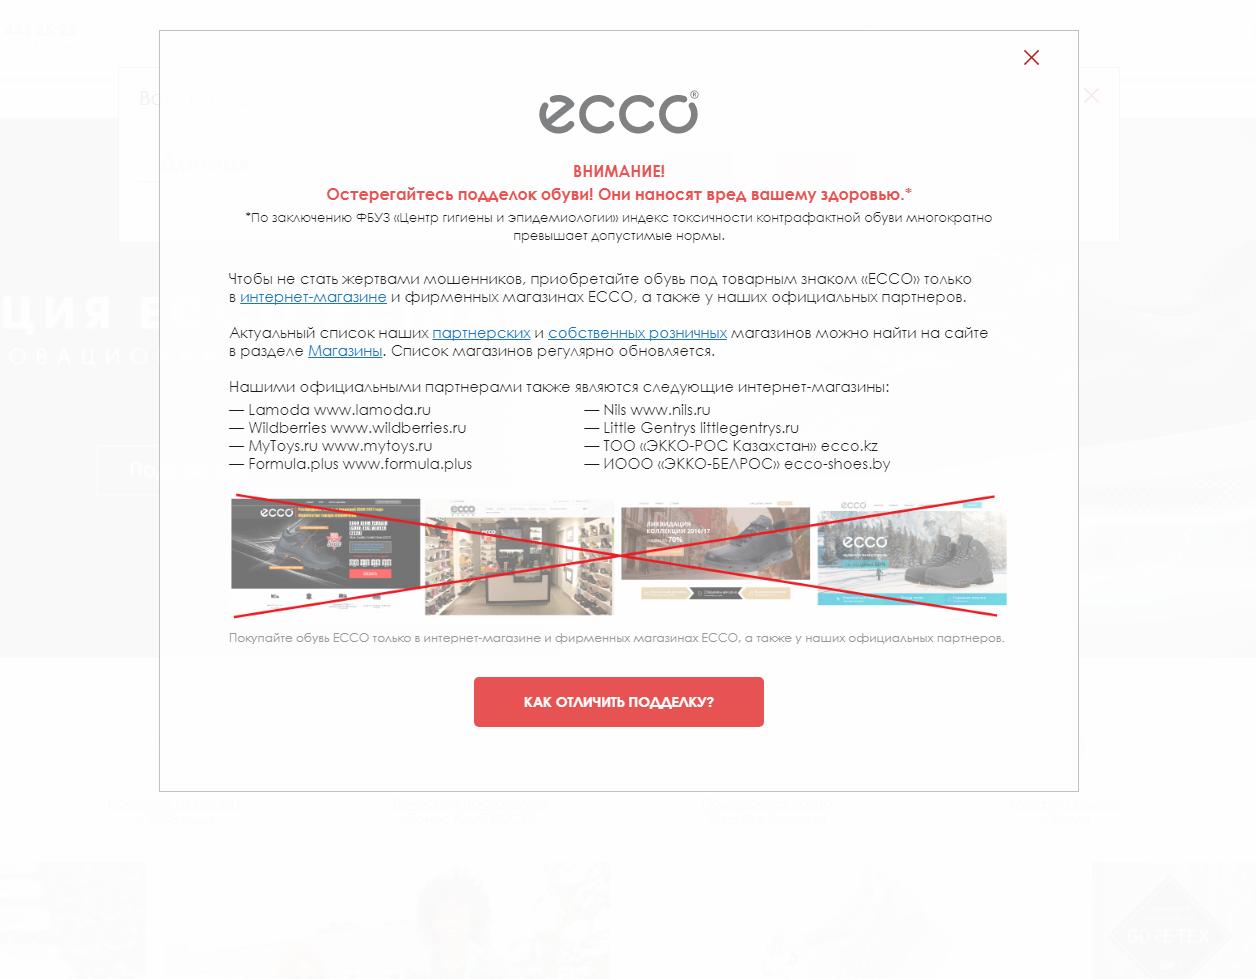 Поп-ап объявление на сайте ECCO